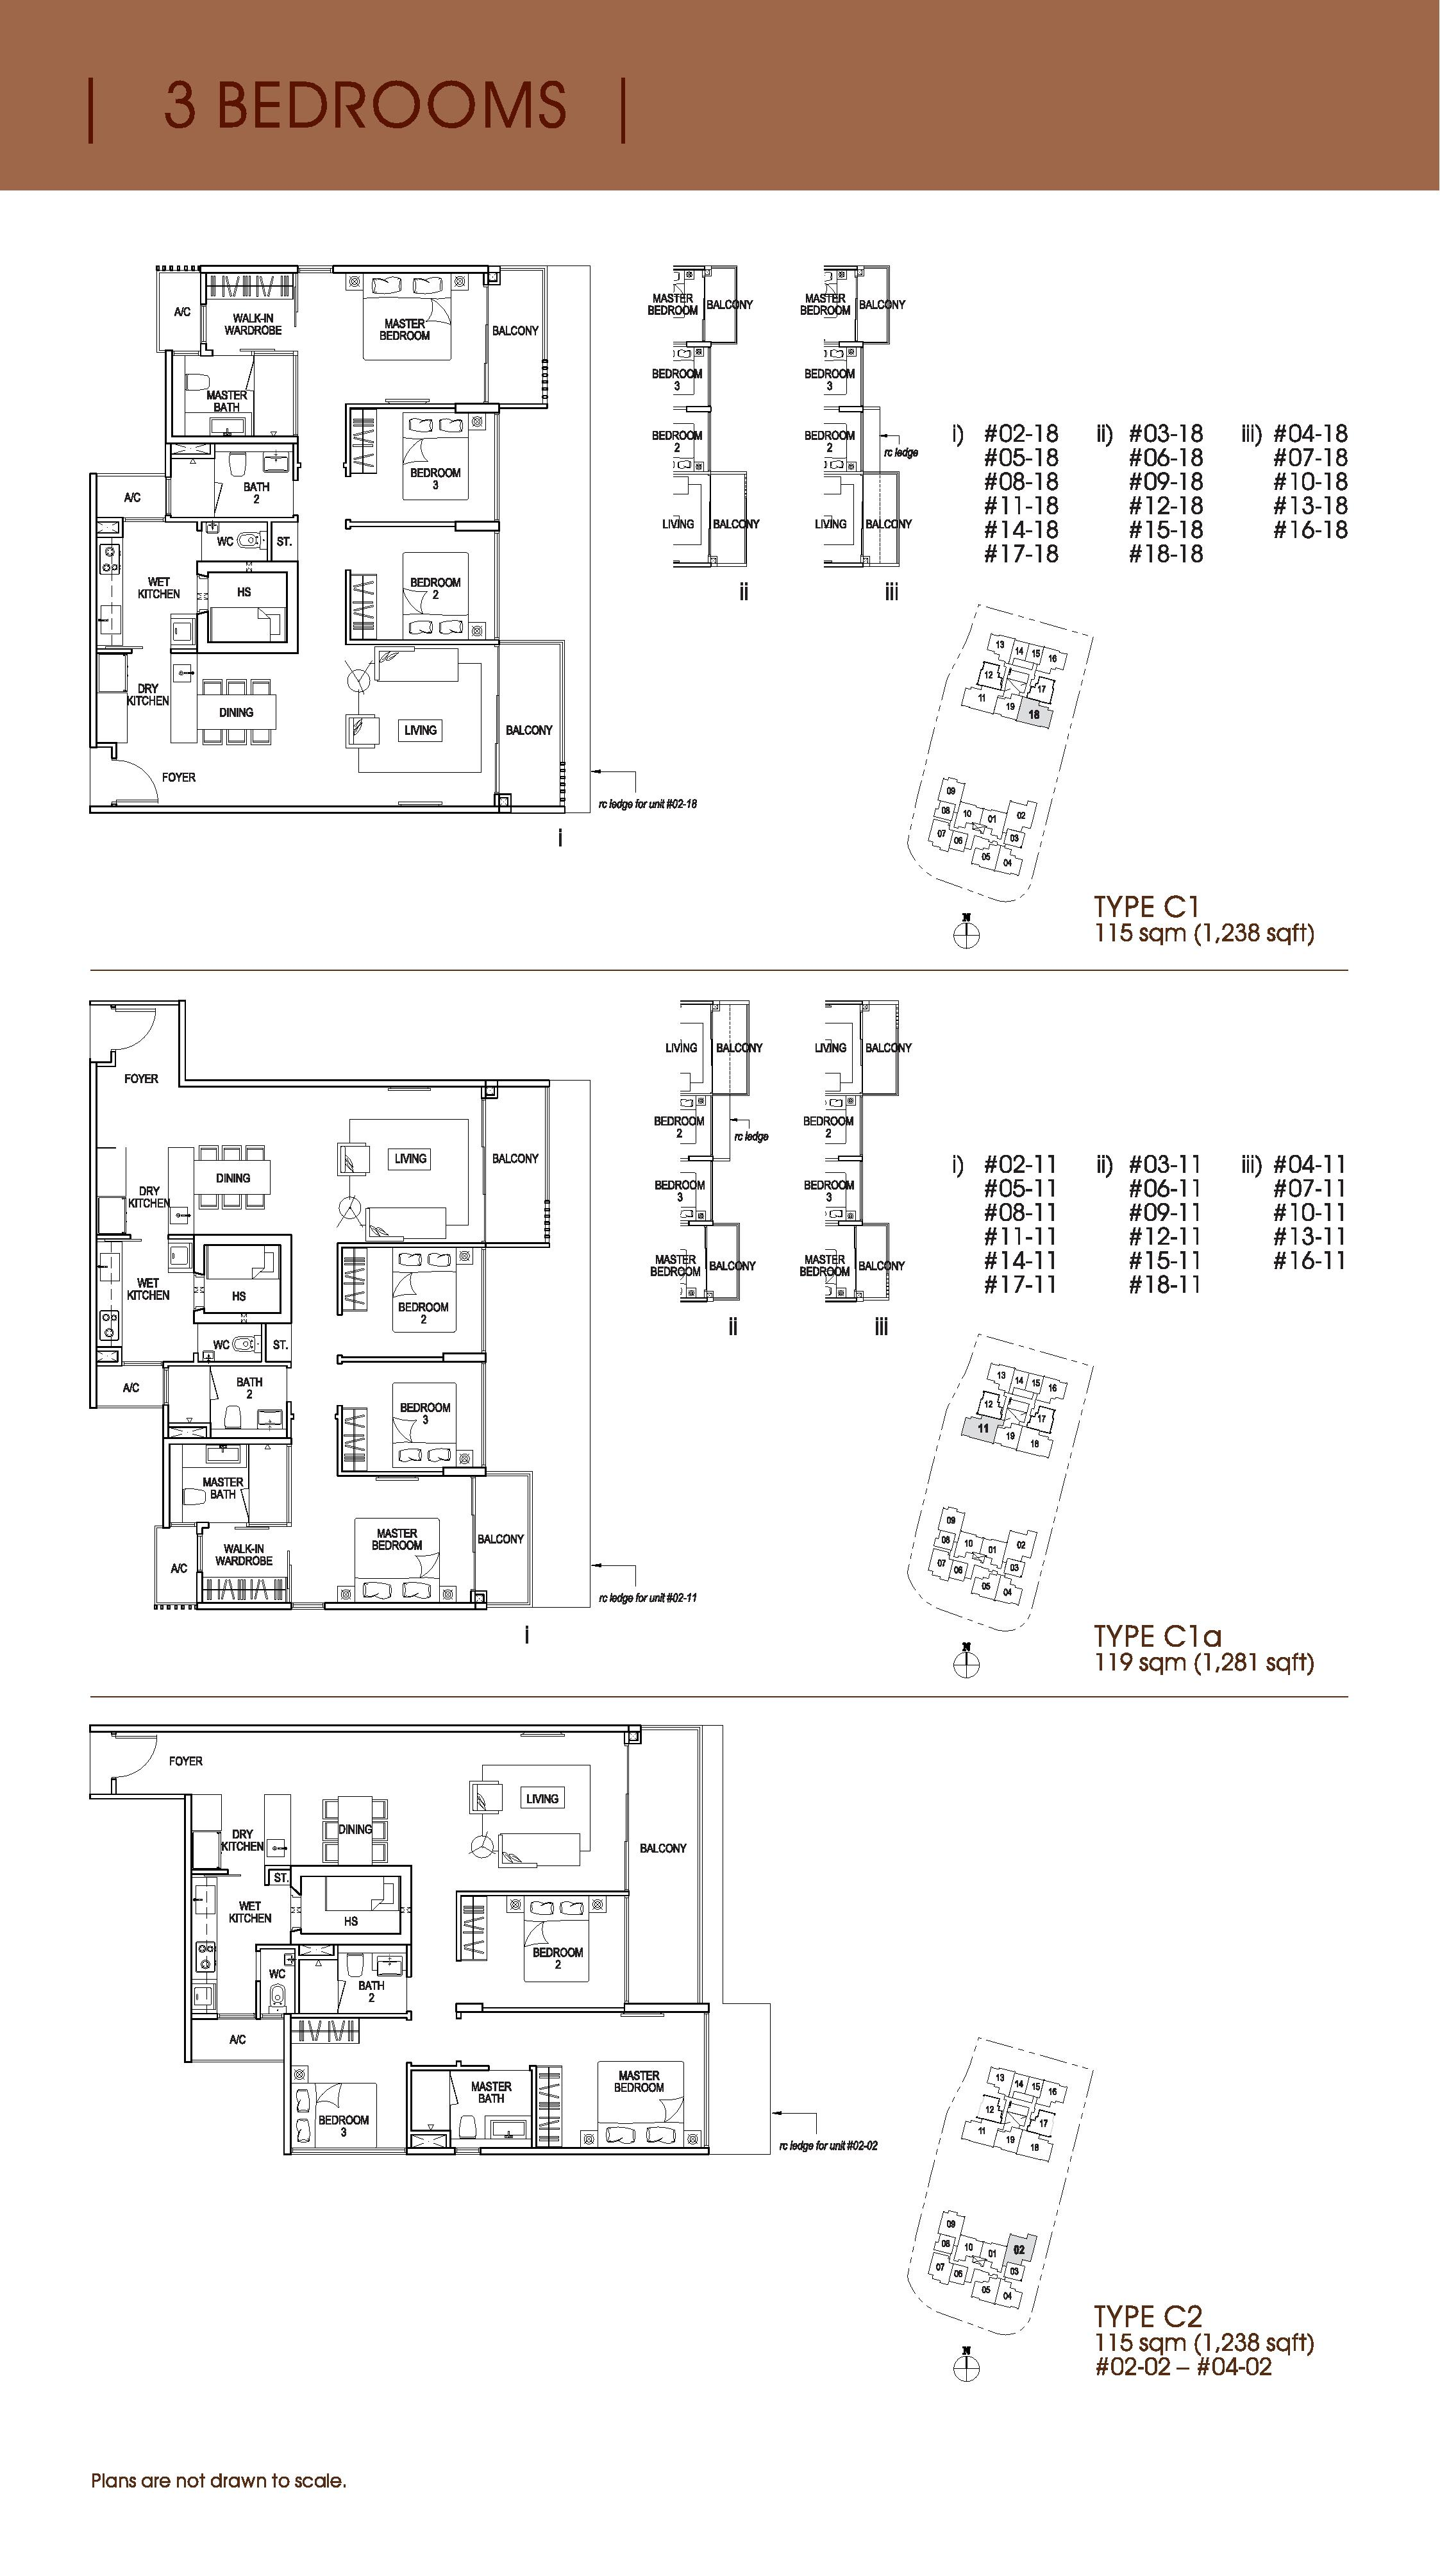 Nin Residence 3 Bedroom Floor Plans Type C1, C1a, C2